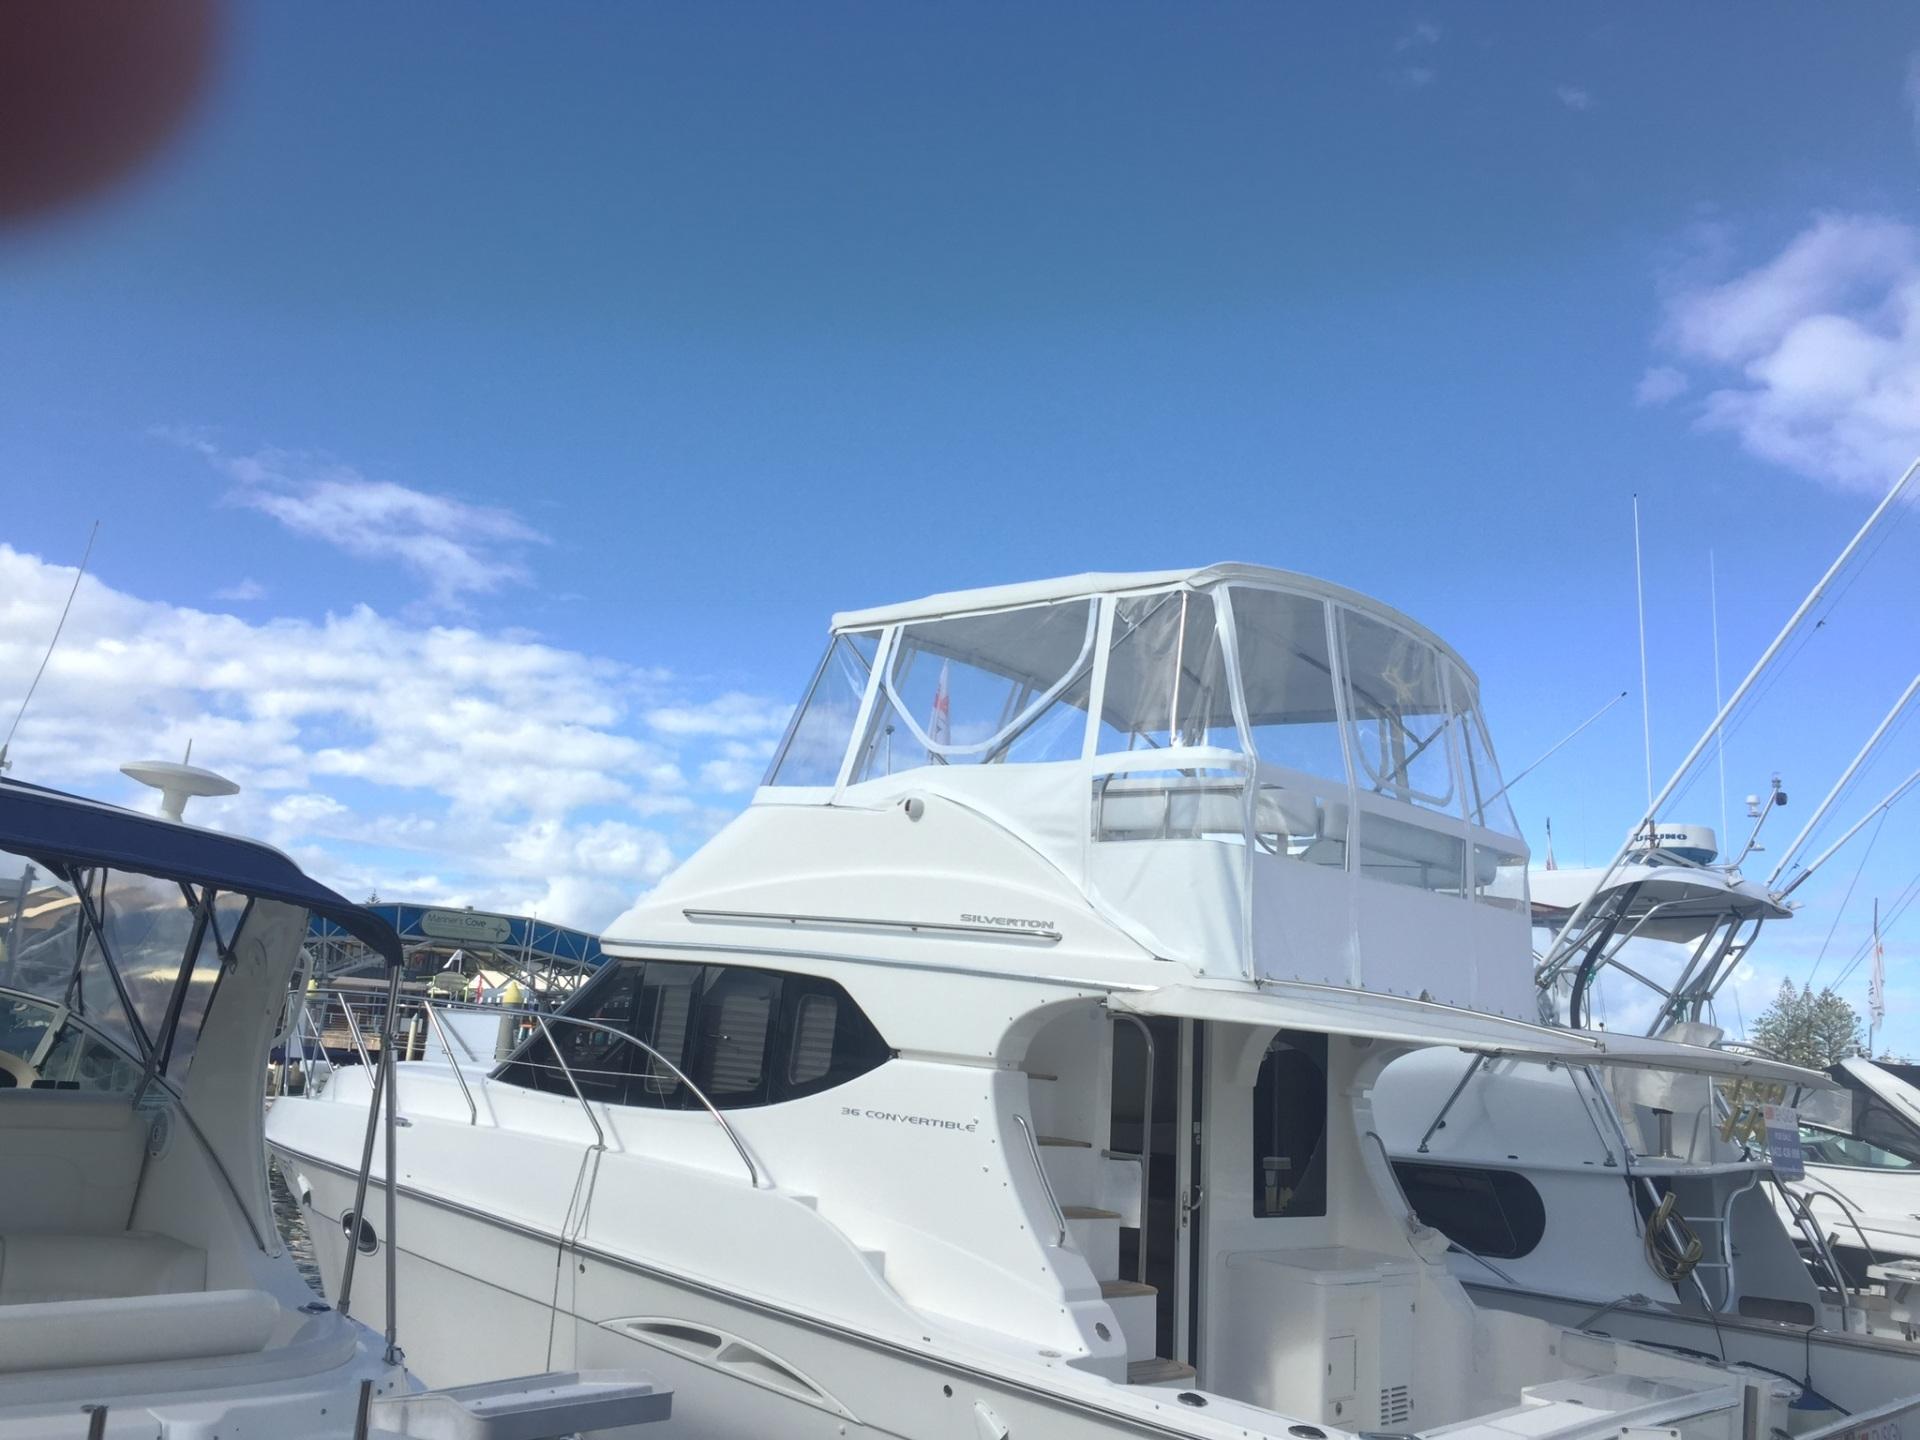 Tim Simmonds Marine Upholstery Gold Coast